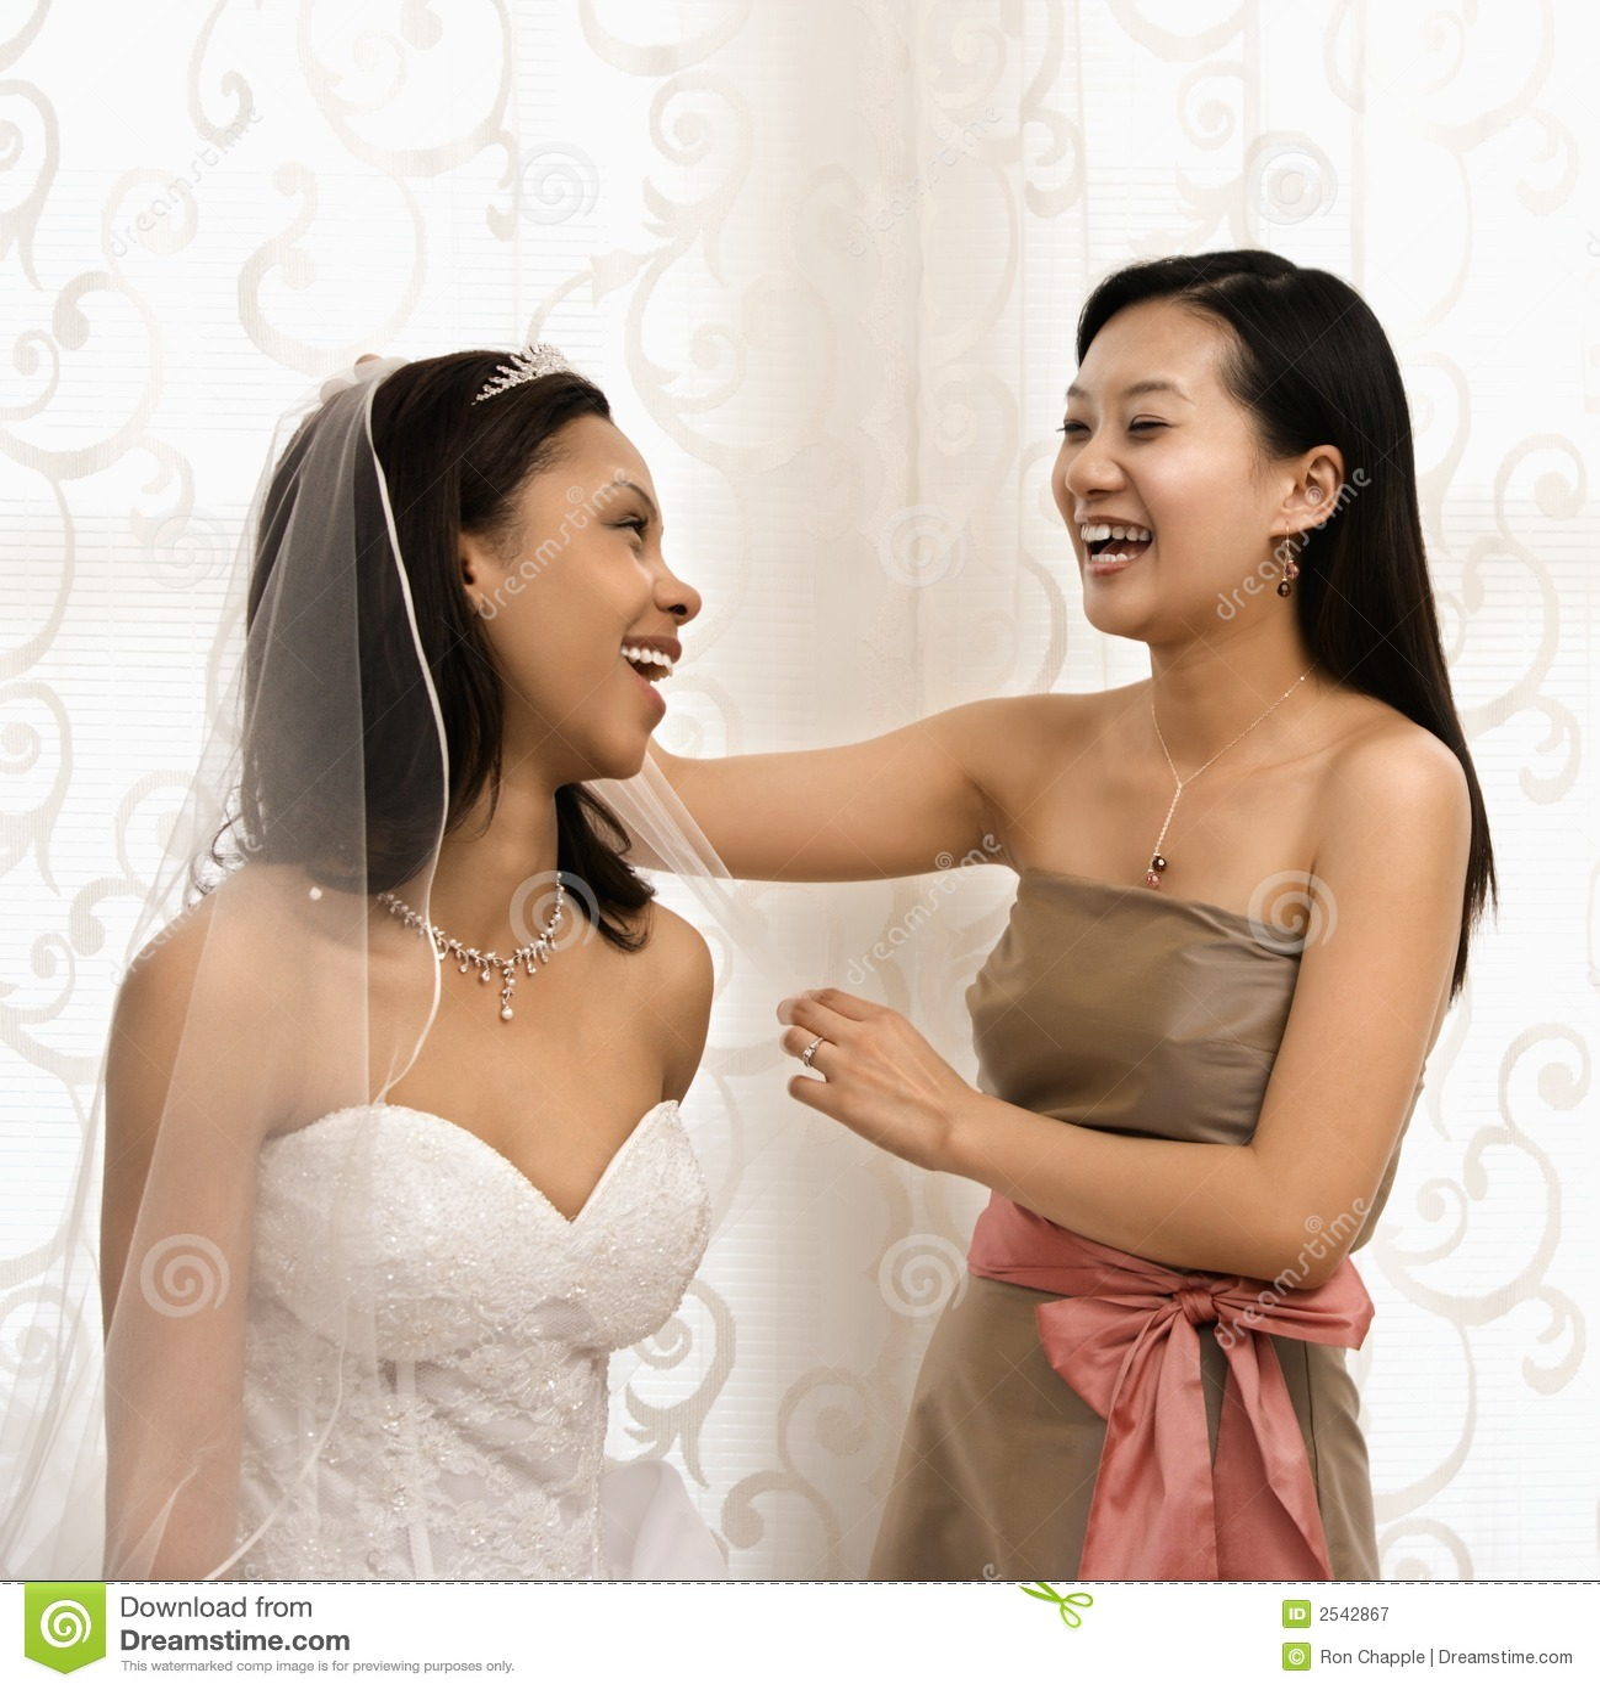 Laughing bride and bridesmaid.